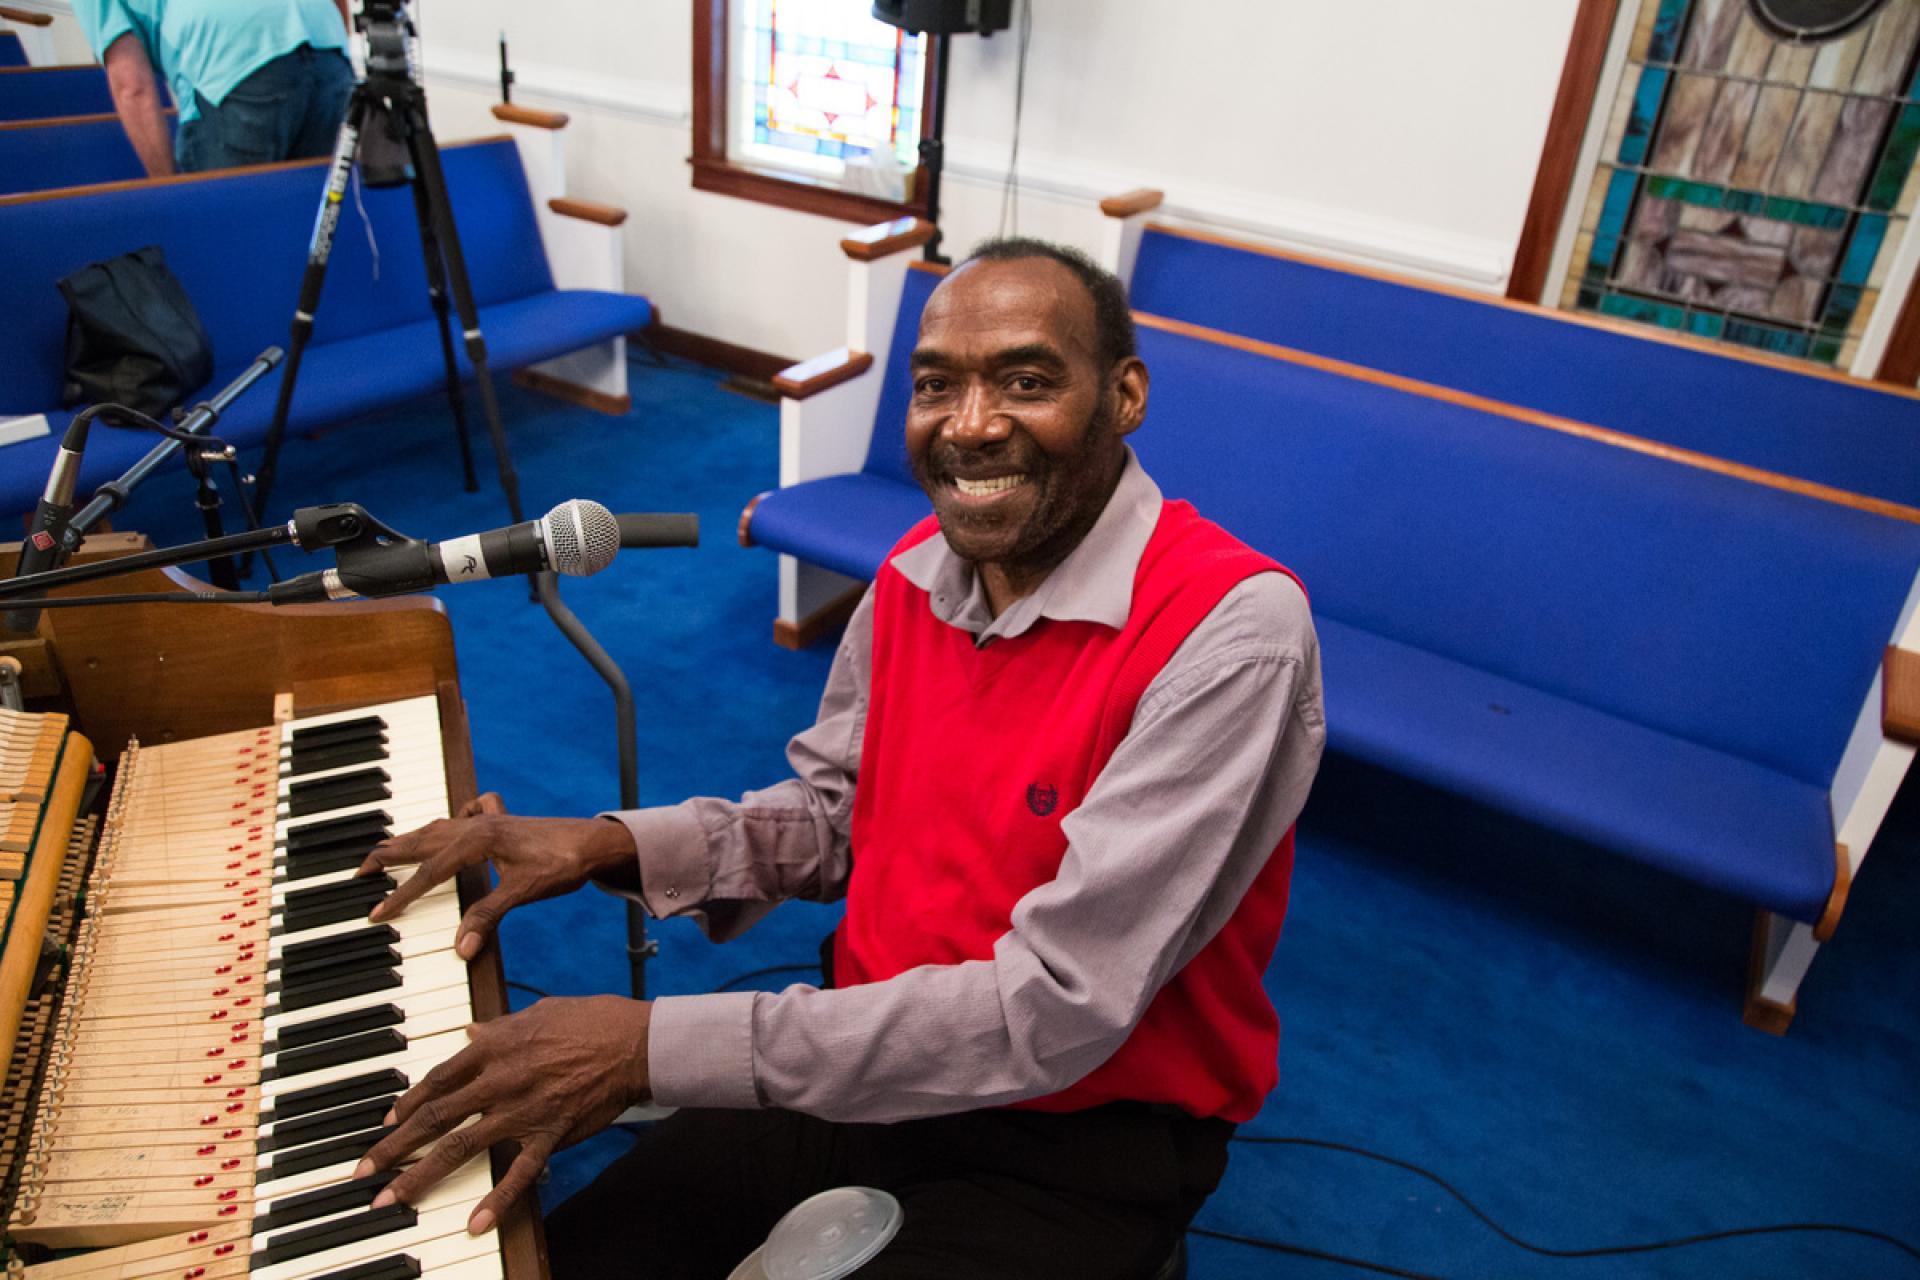 Branchettes pianist WIlbur Tharpe